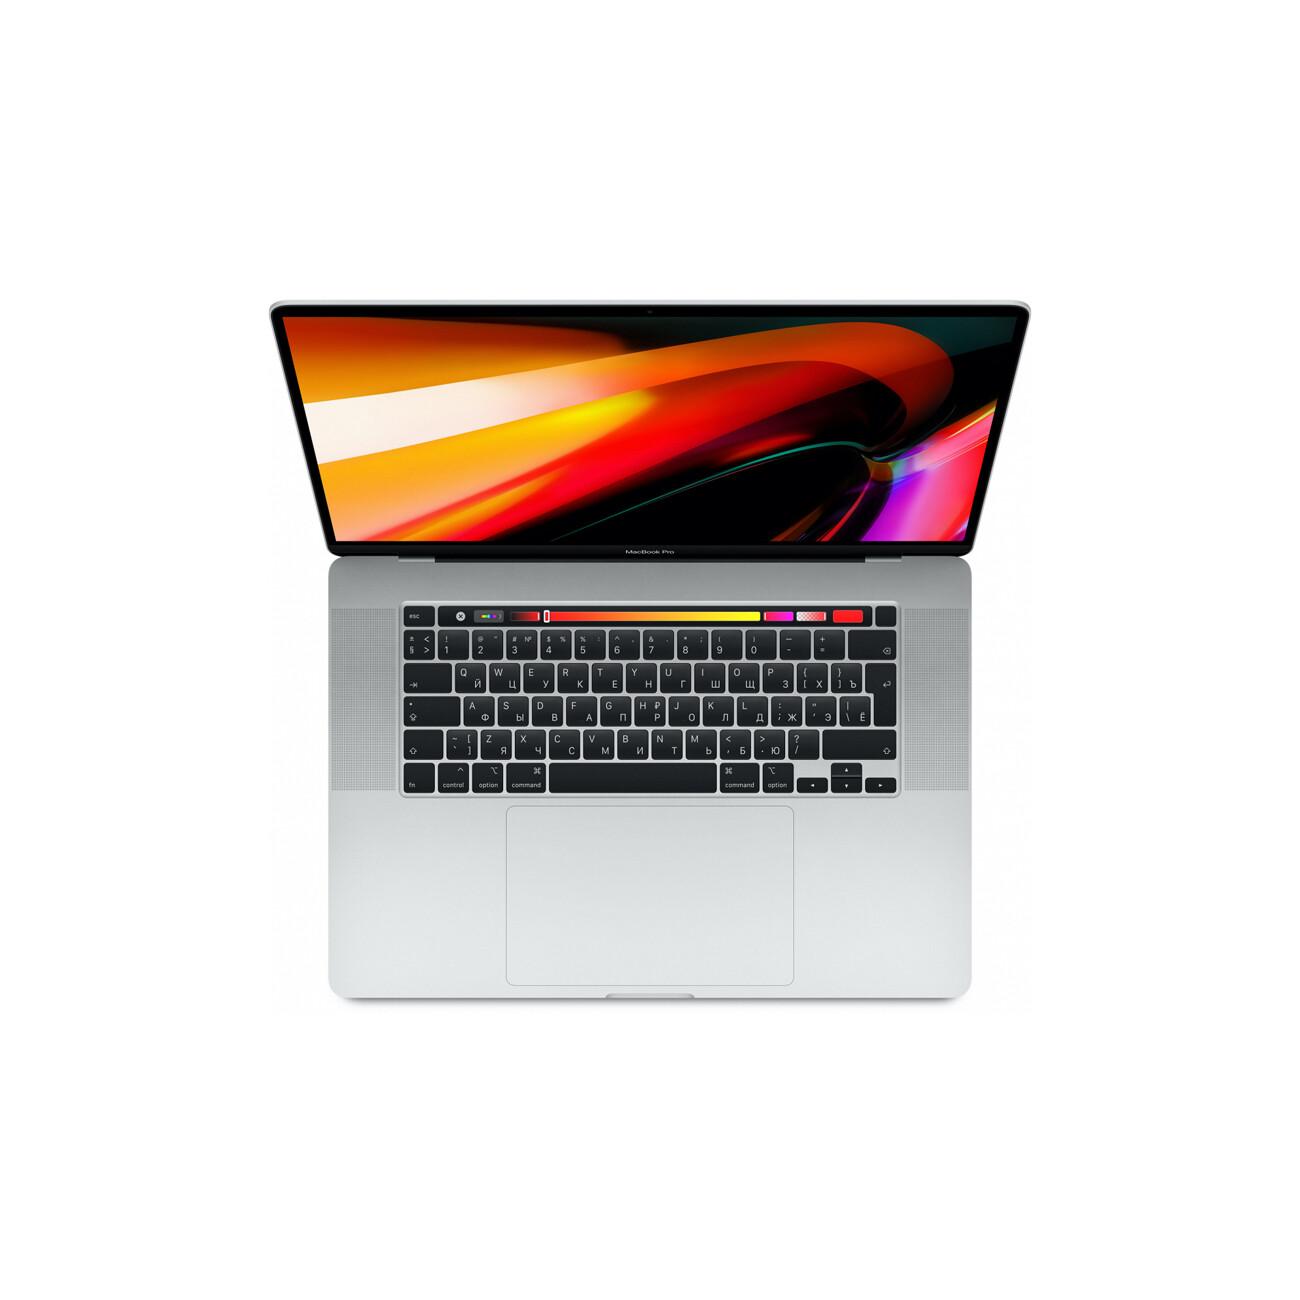 "Apple MacBook Pro 16"" 8 Core i9 2,3 ГГц, 16 ГБ, 1 ТБ SSD, AMD Radeon Pro 5500M, Touch Bar, серебристый"